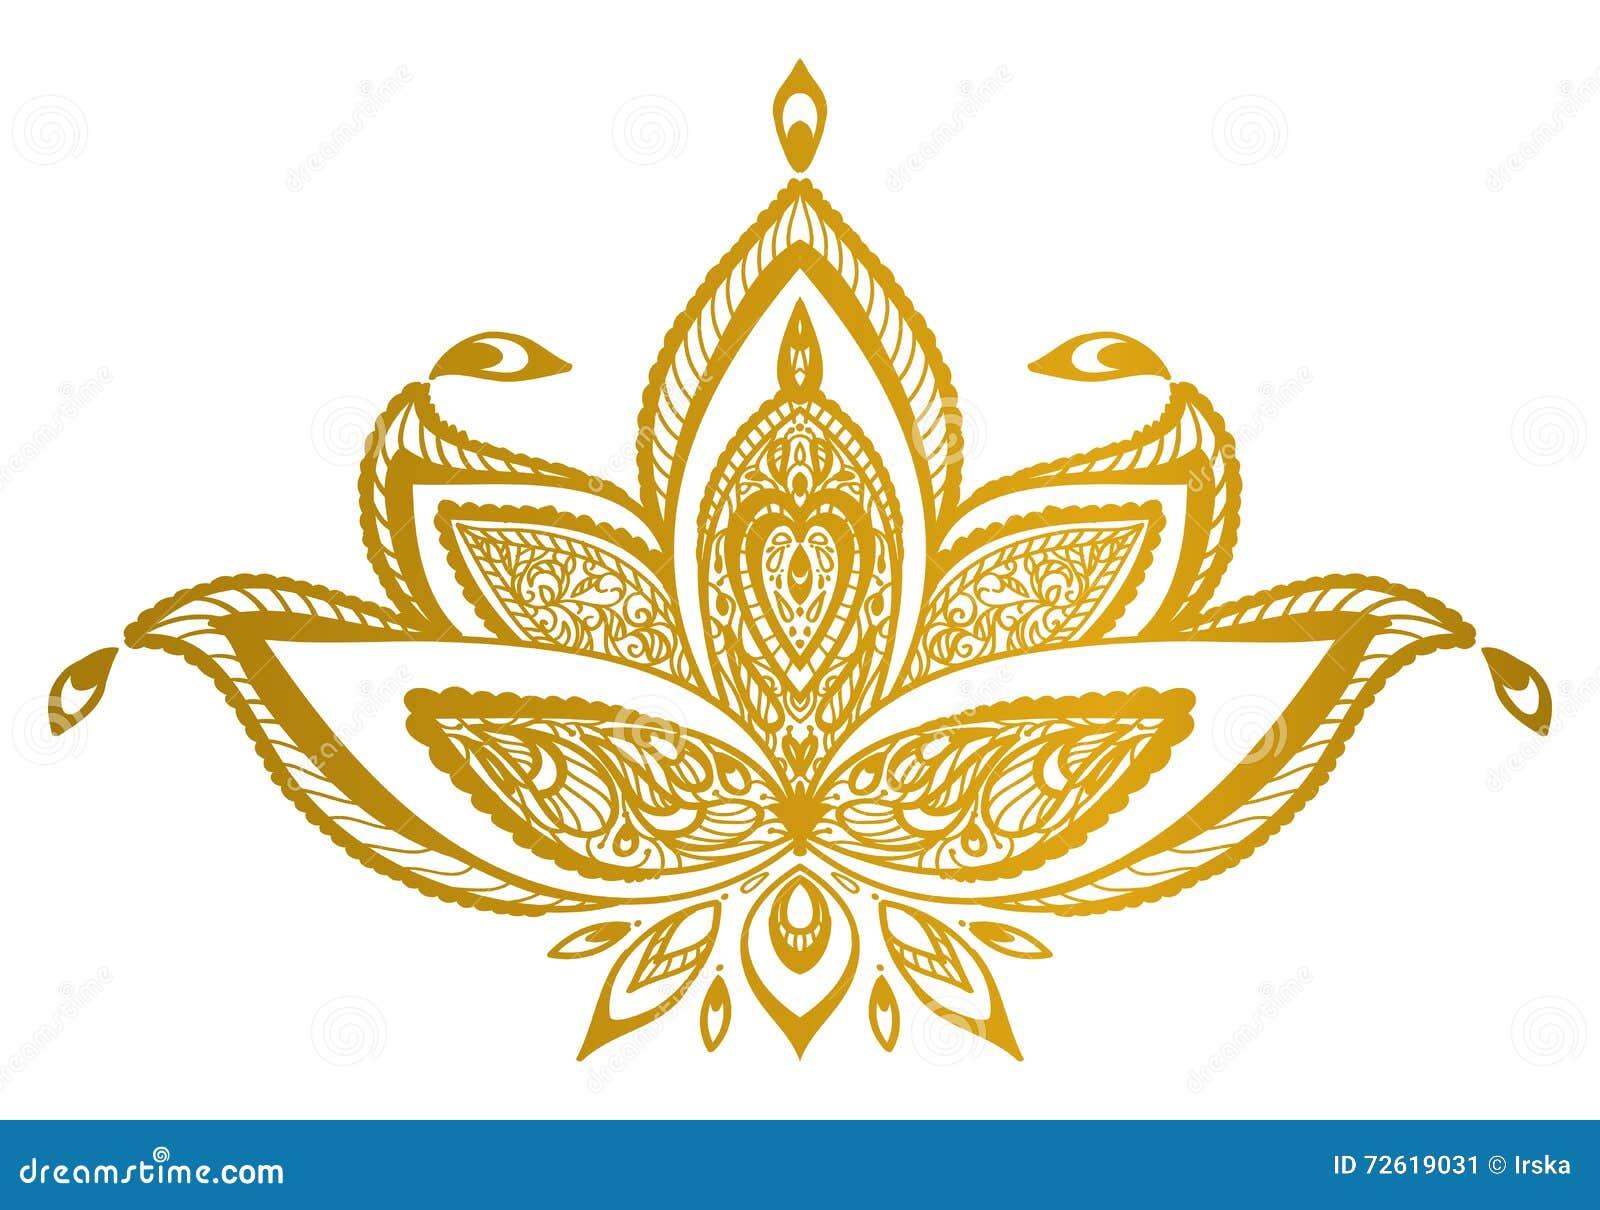 Gouden mandala van de lotusbloemgrens